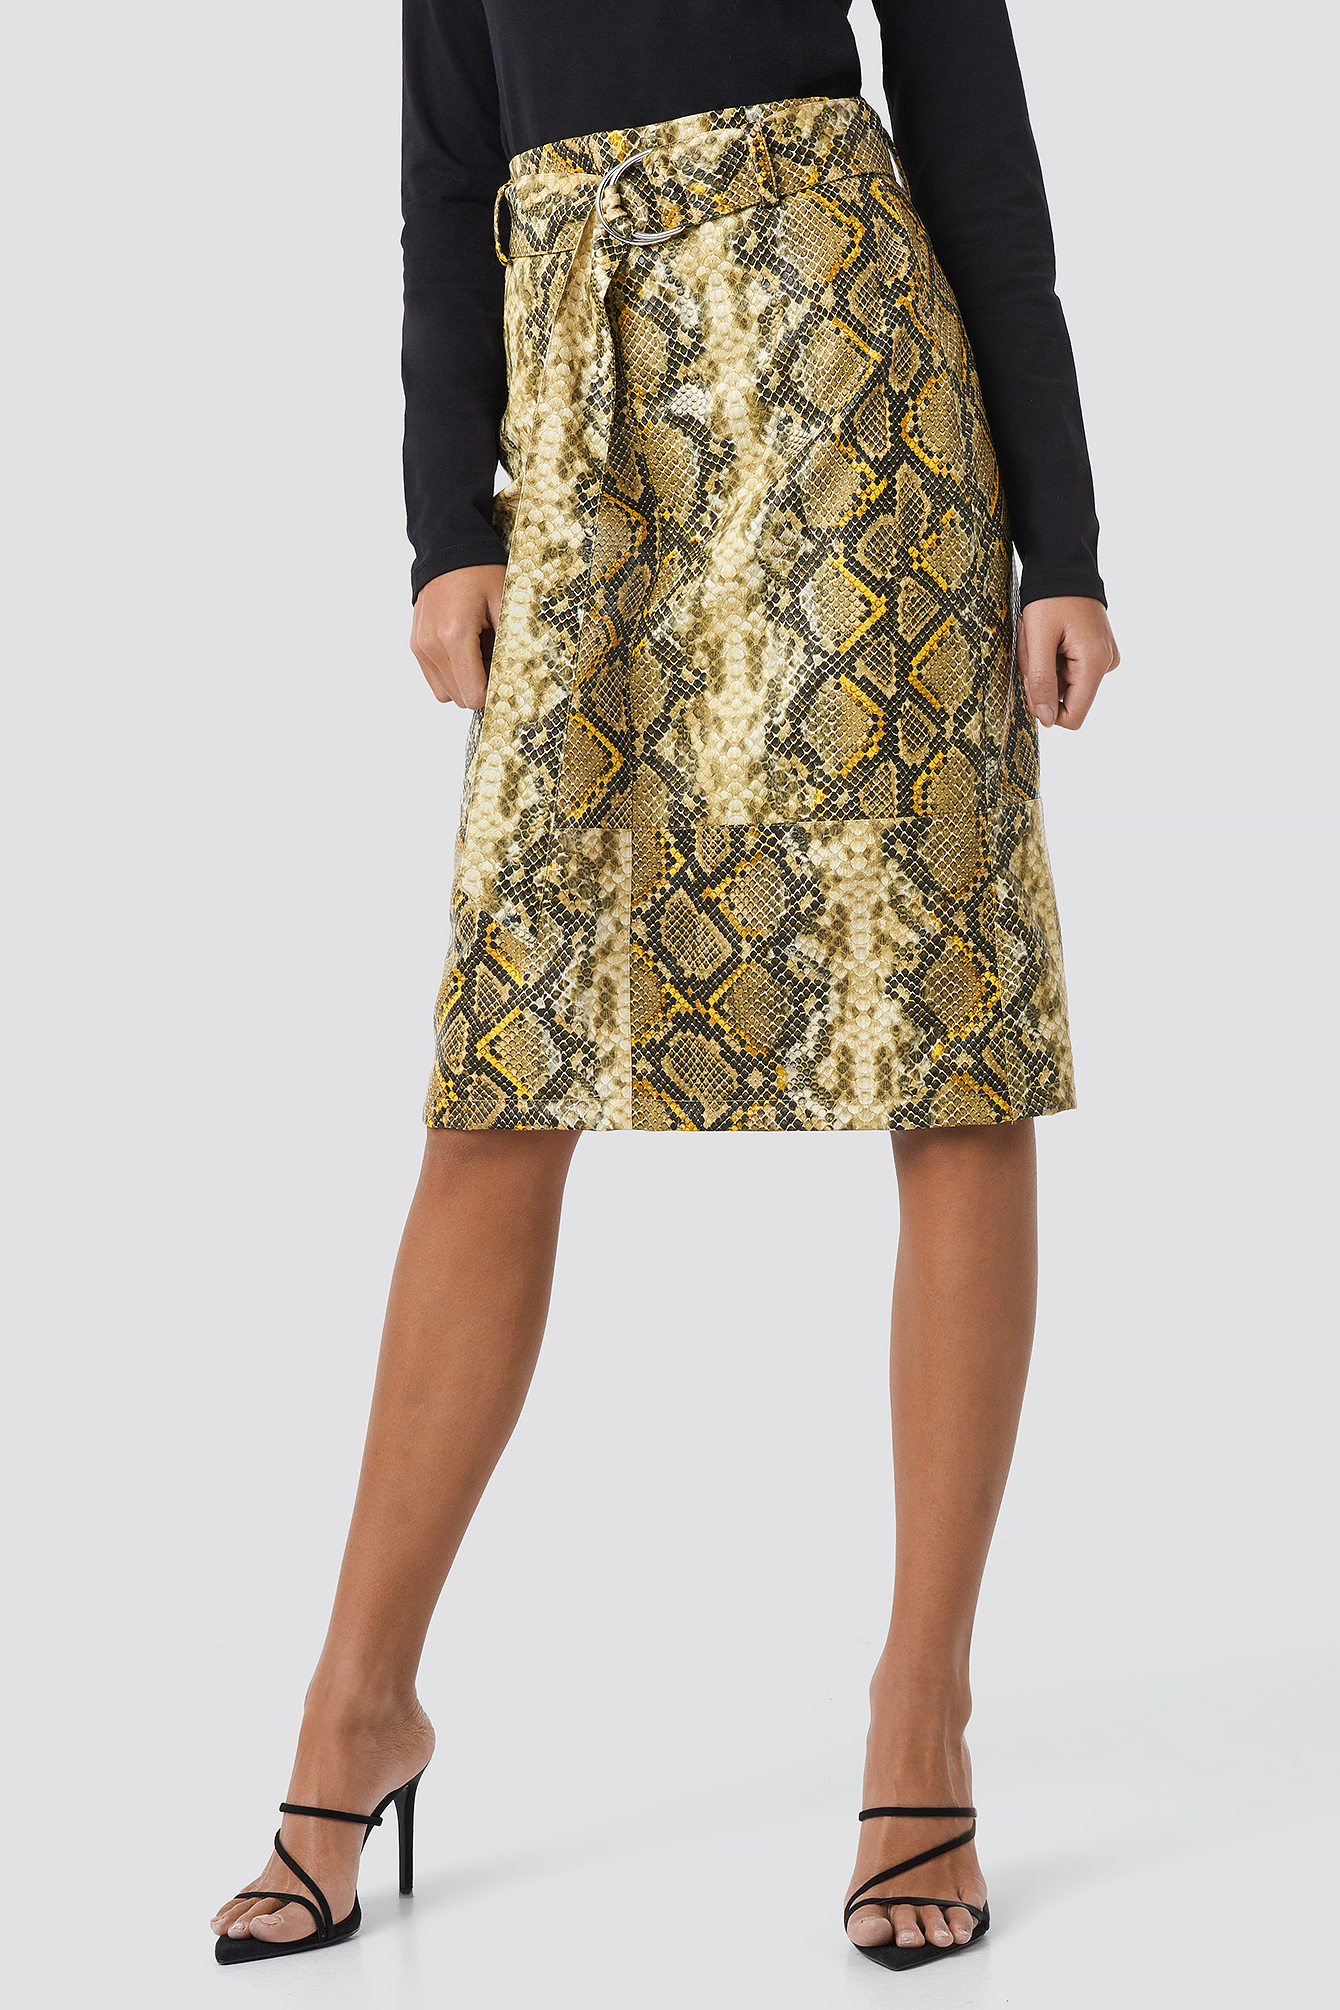 Snake Printed Belted PU Skirt NA-KD.COM